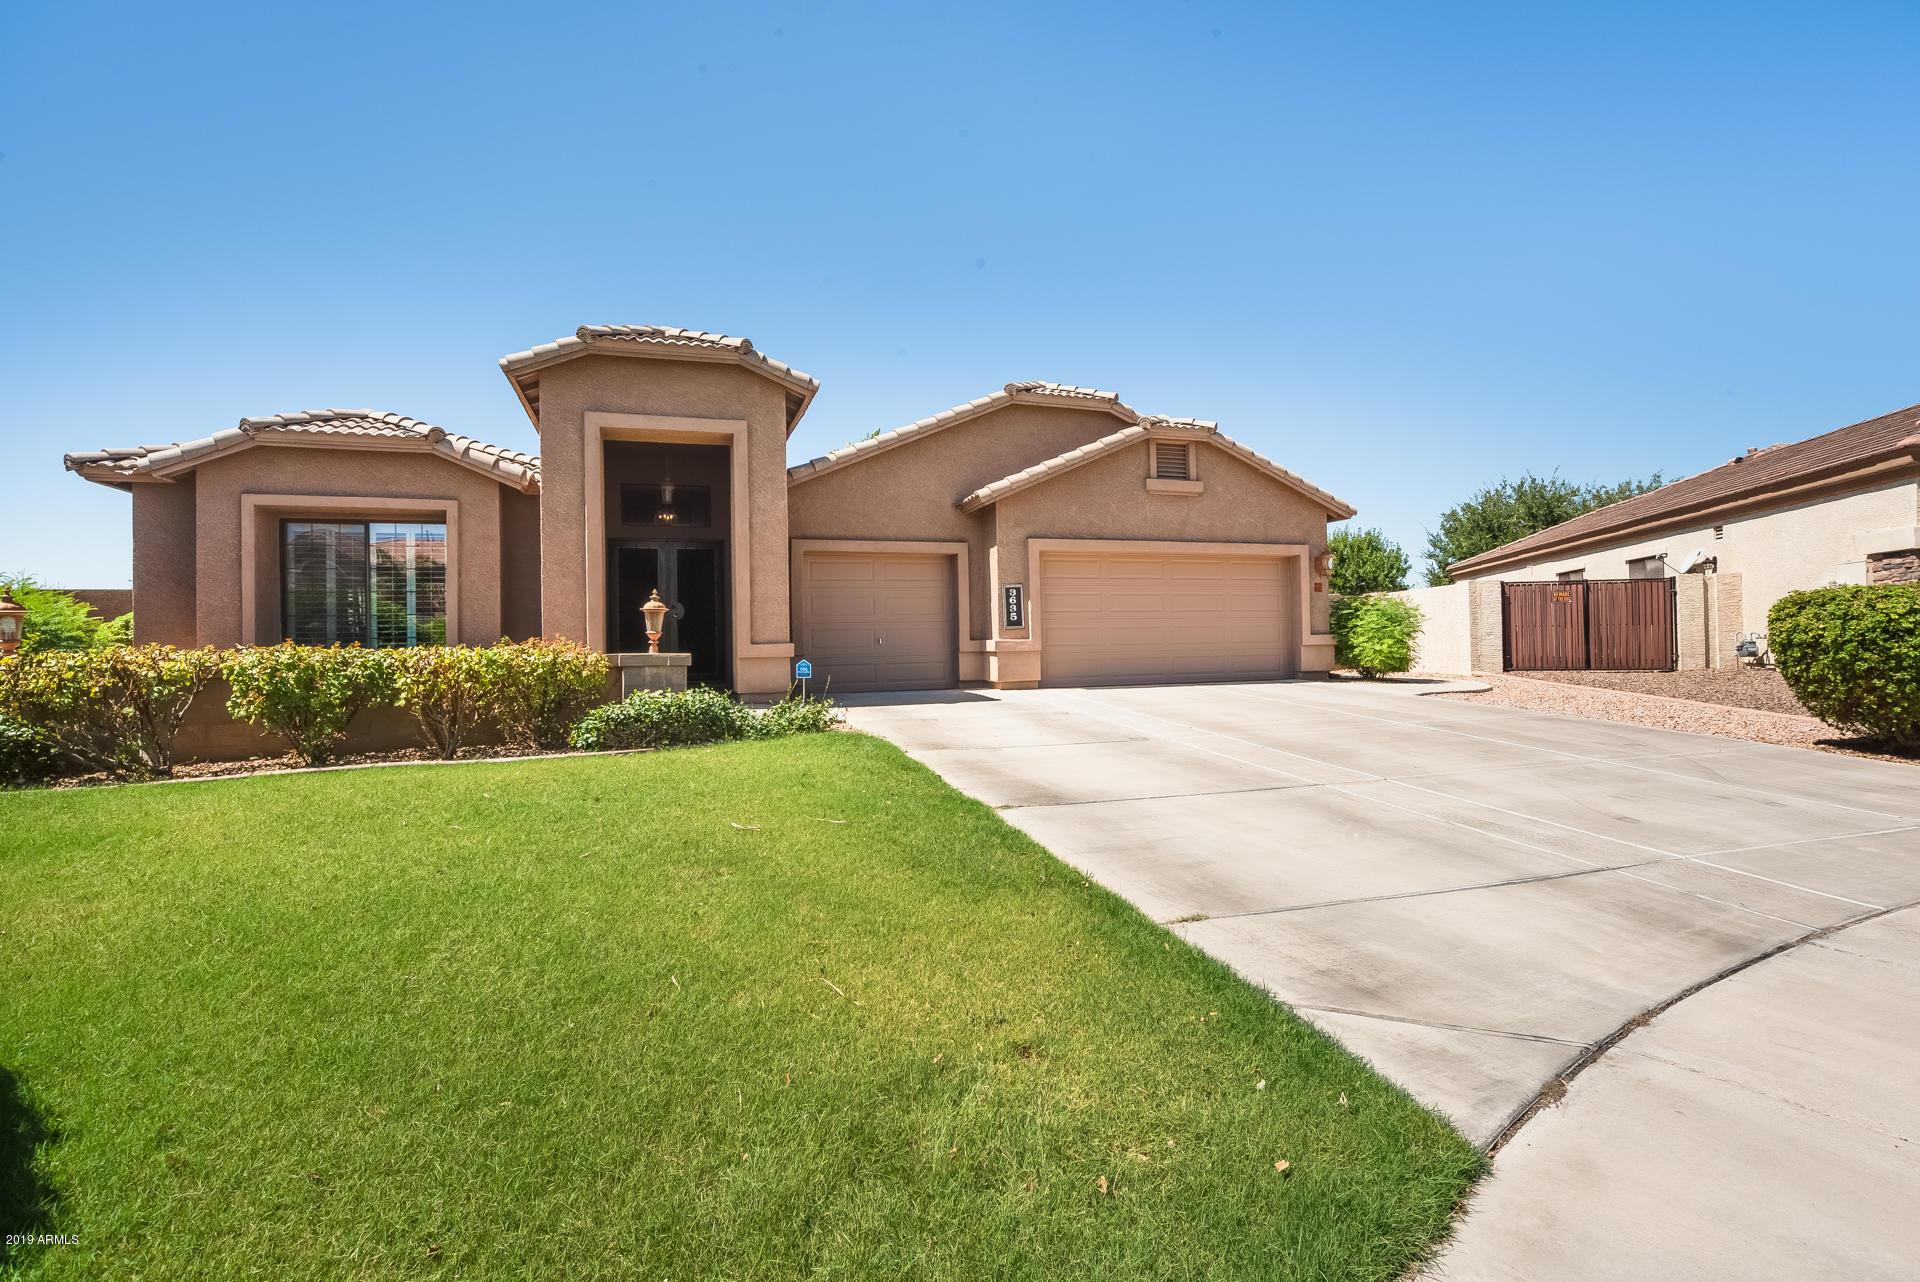 Photo of 3635 E LOMA VISTA Street, Gilbert, AZ 85295